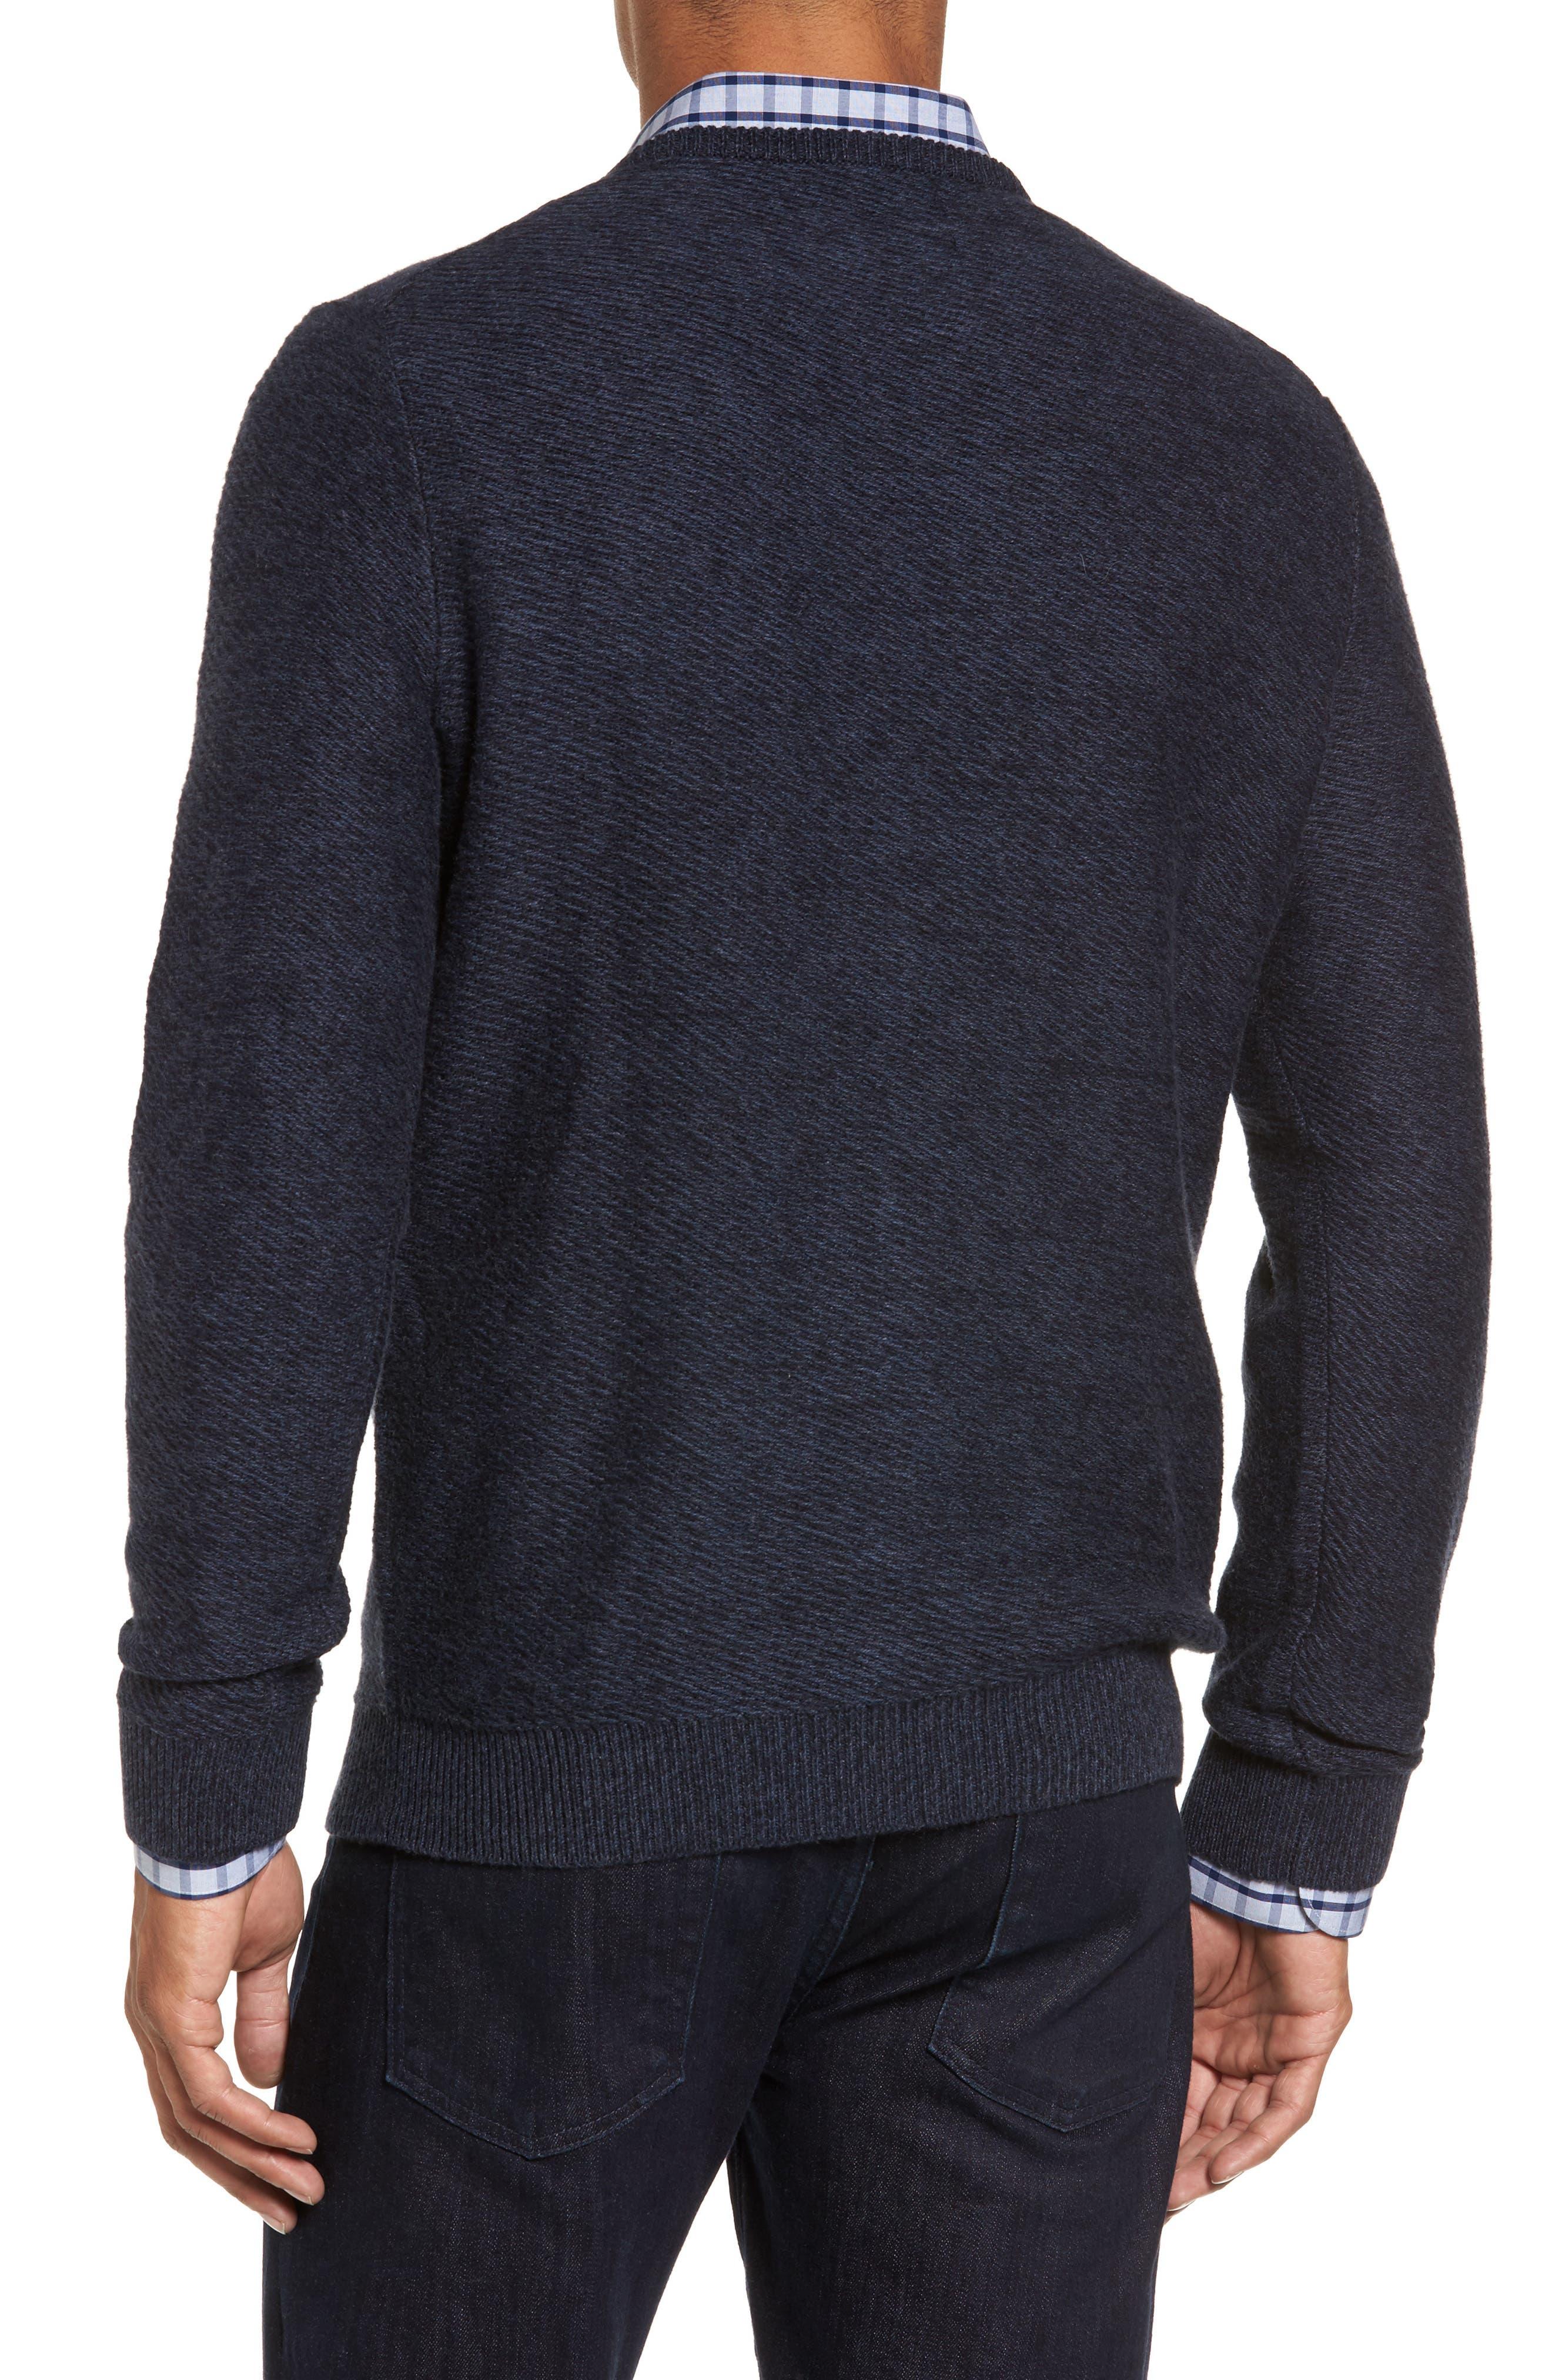 Cotton & Cashmere V-Neck Sweater,                             Alternate thumbnail 3, color,                             Navy Iris Melange